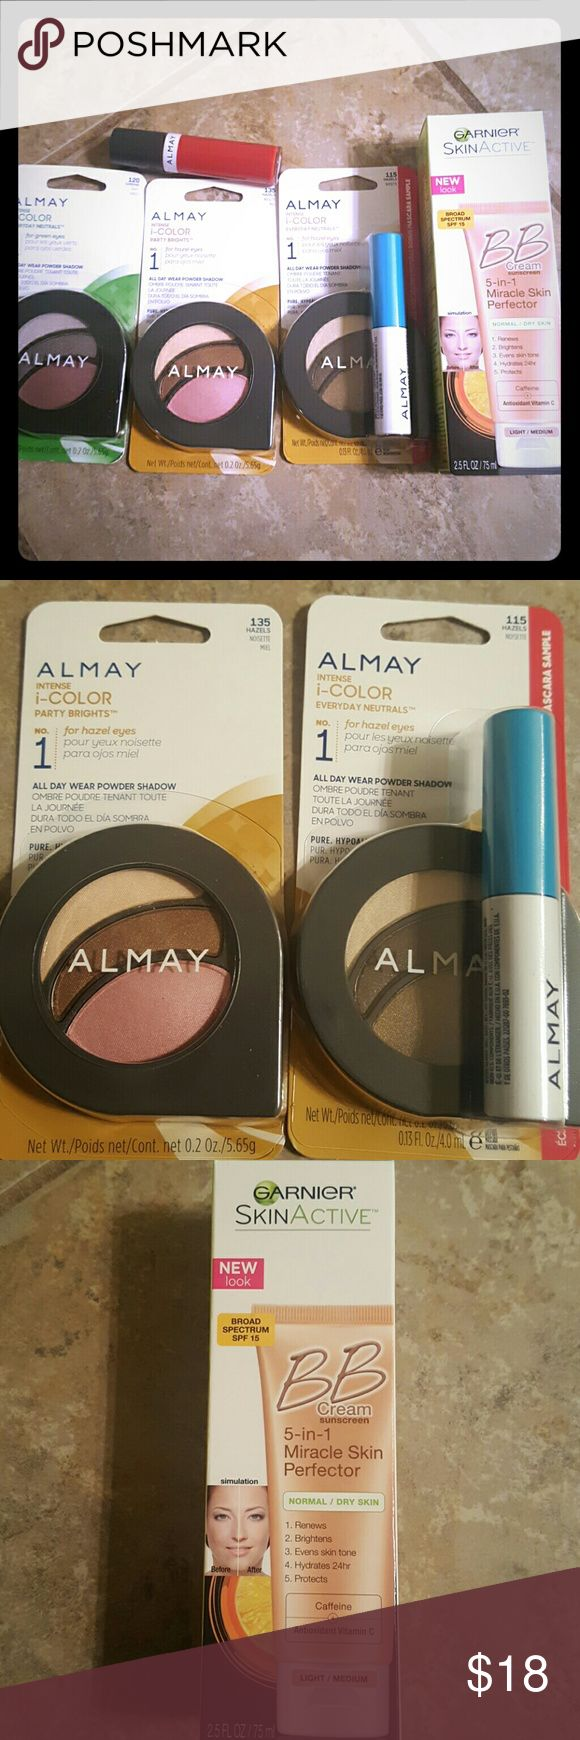 "Makeup bundle Light to medium skin tone,hazel eye bundle with a bonus green eye kit. Garnier BB Cream 5 in 1 Miracle Protector. Lipgloss in ""Apple a Day"" Makeup"